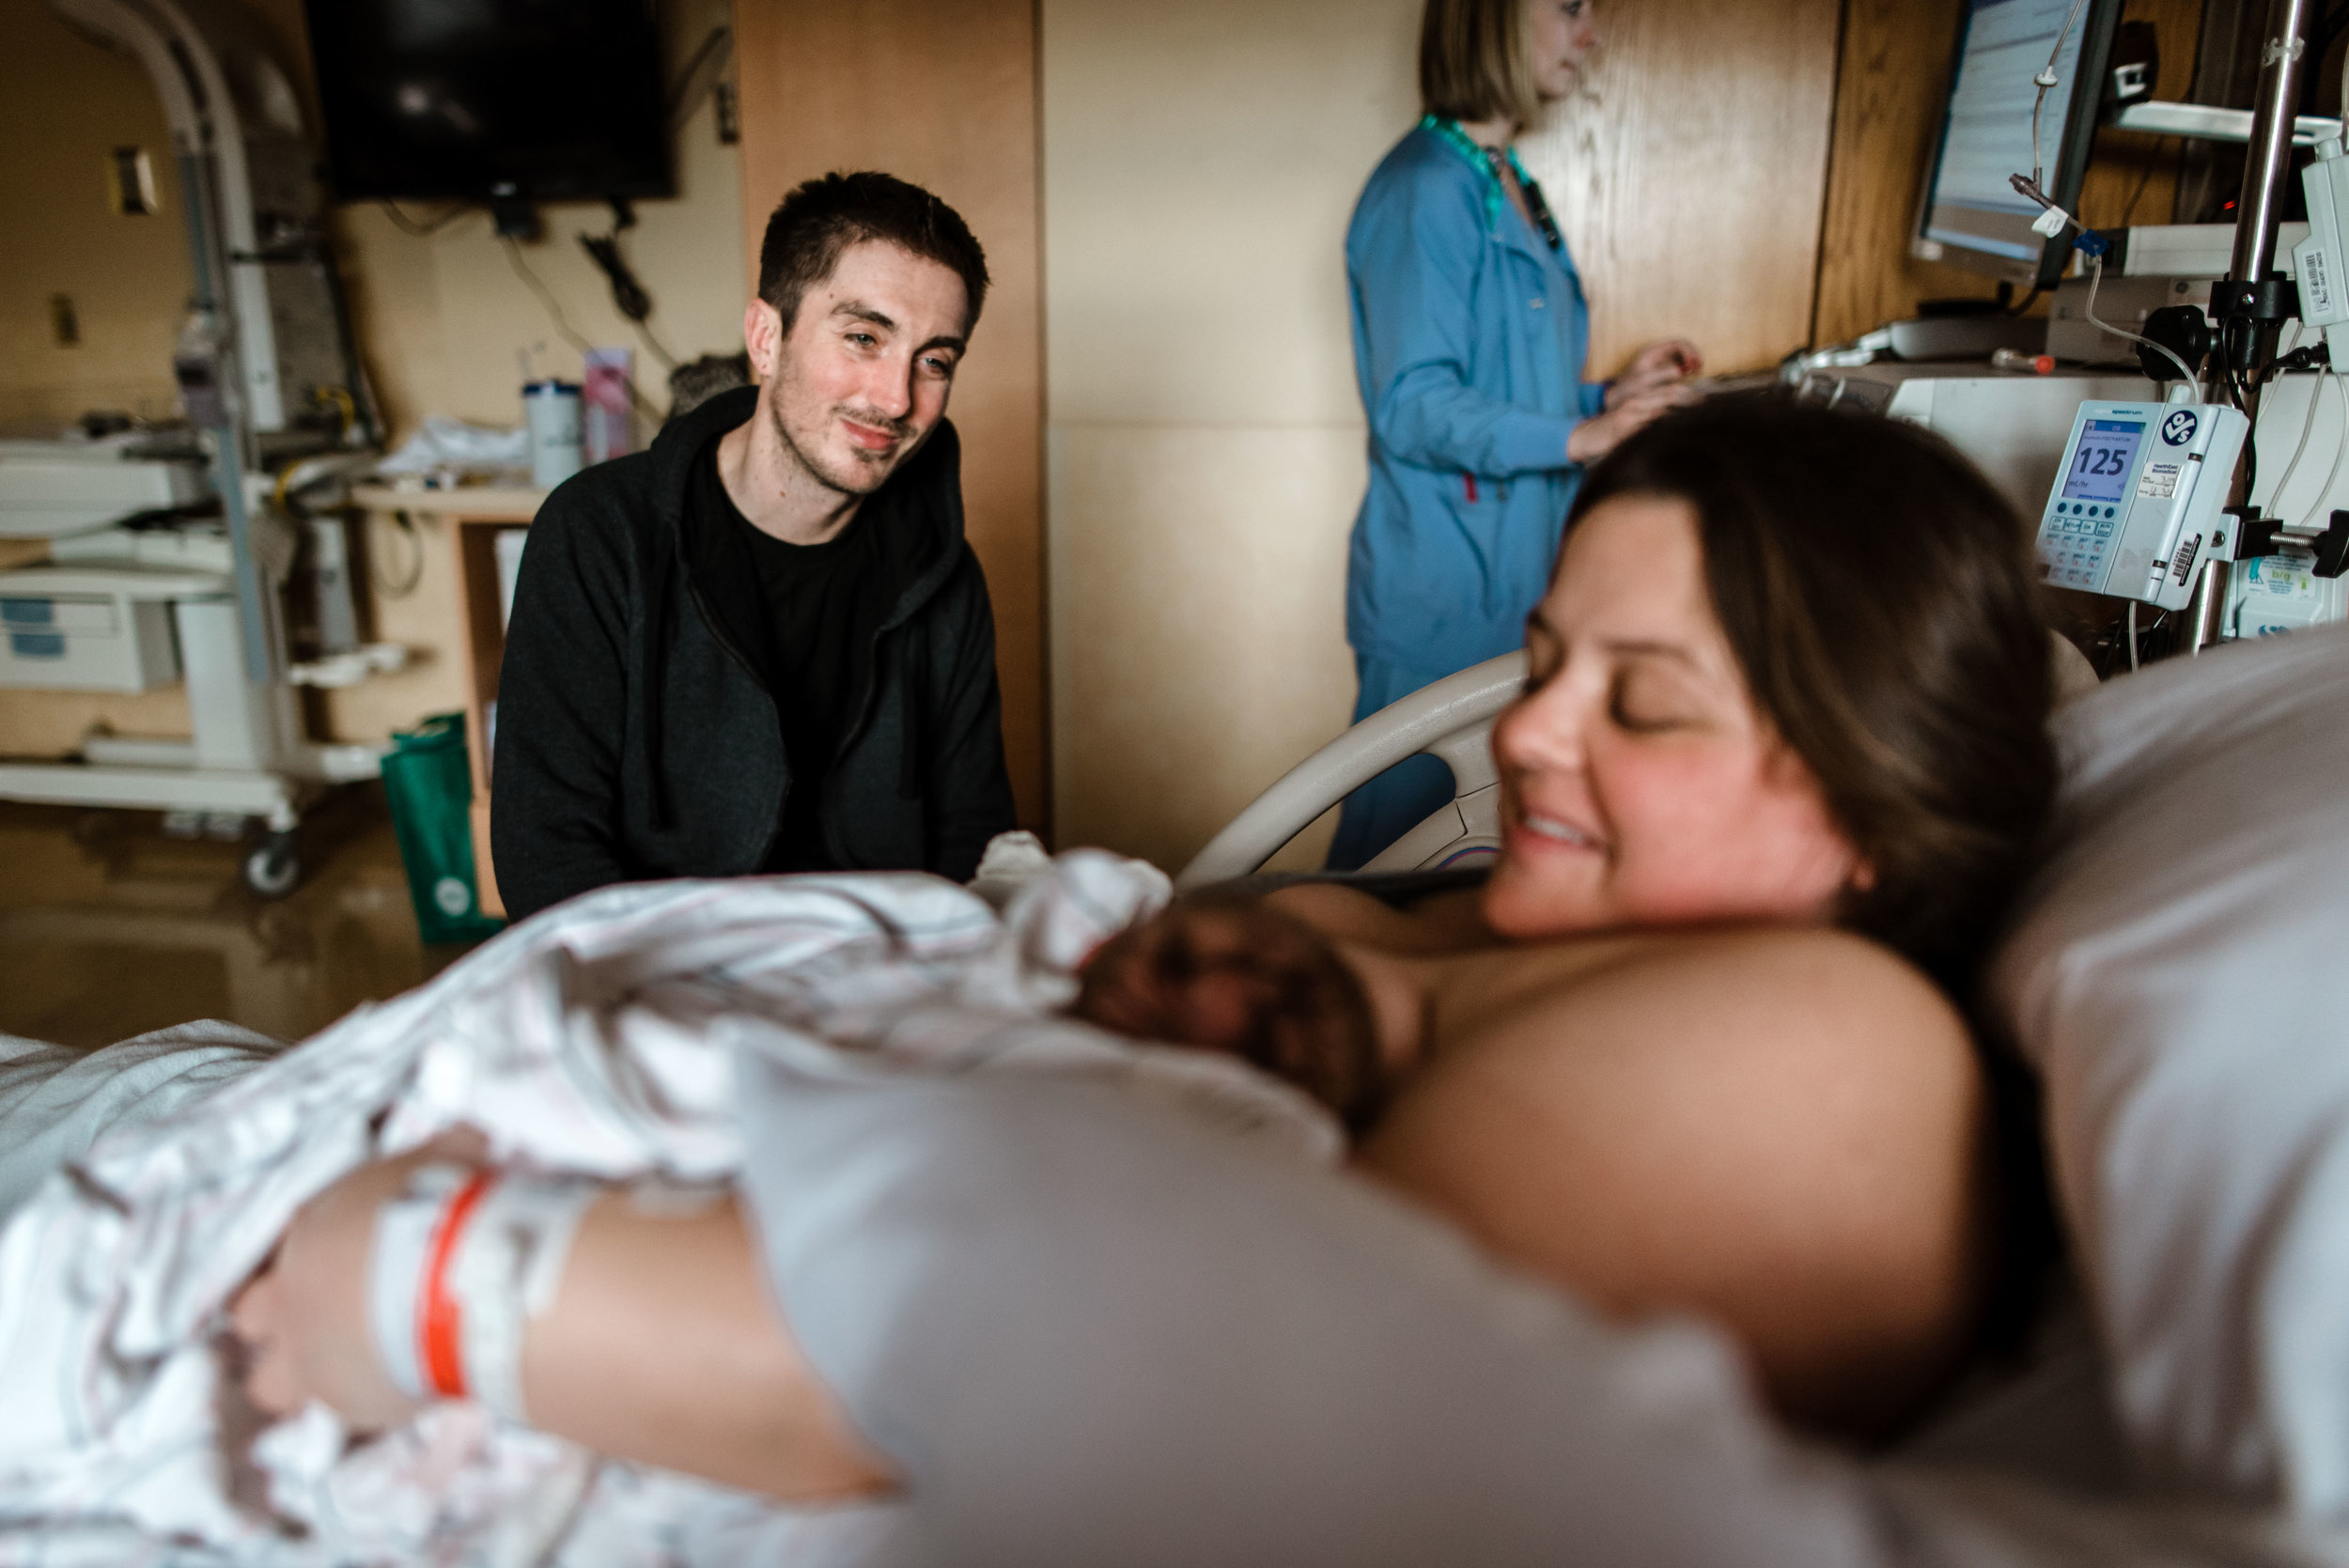 Meredith Westin Photography- Minnesota Birth Stories-January 03, 2019-150739.jpg